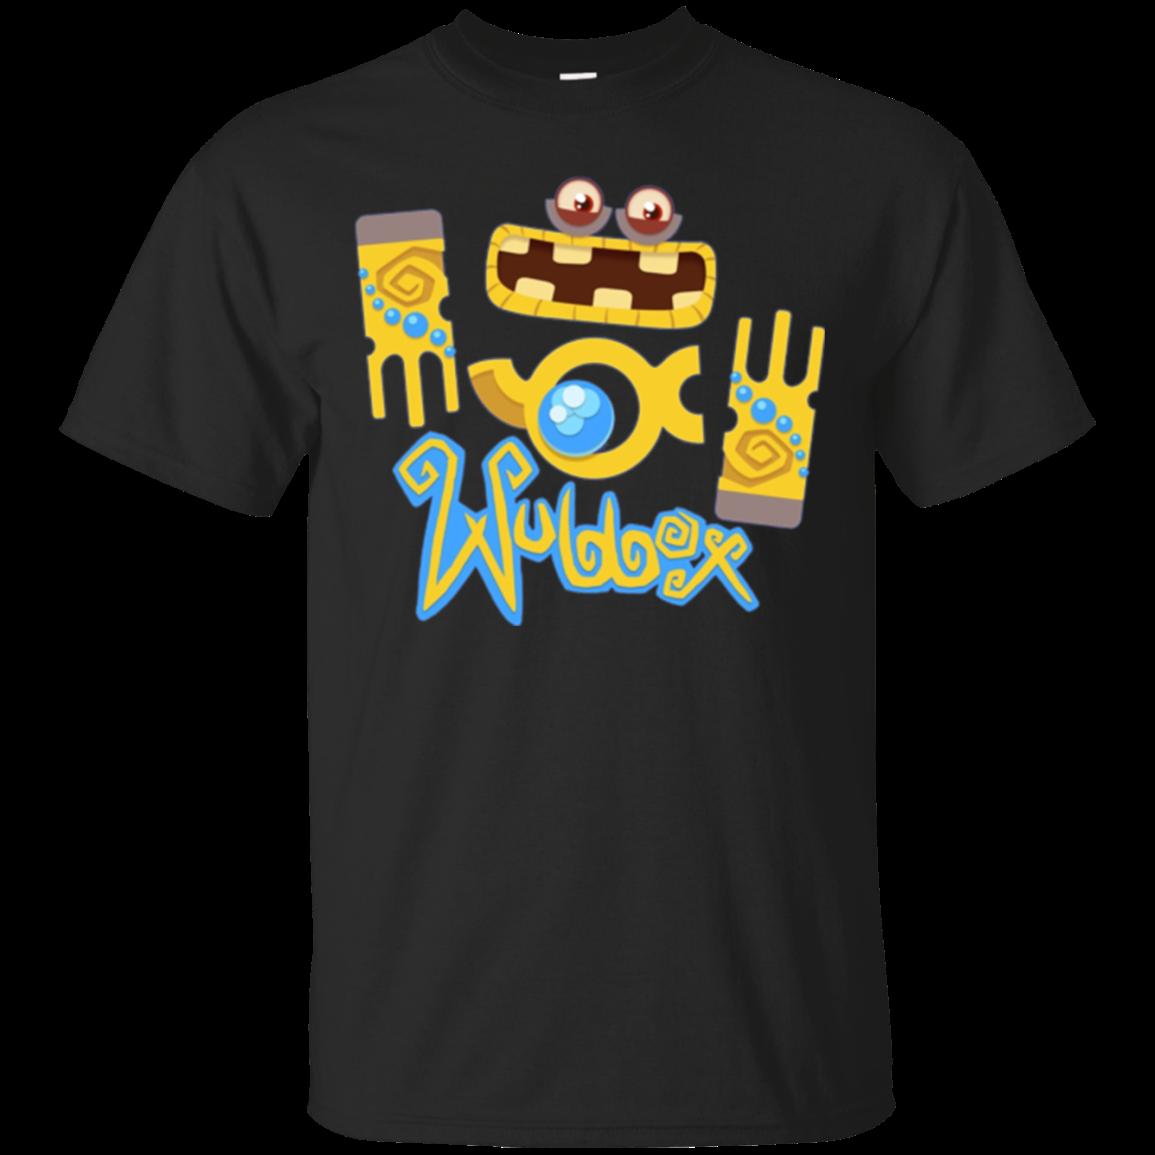 My Singing Monsters Wubbox Shirt